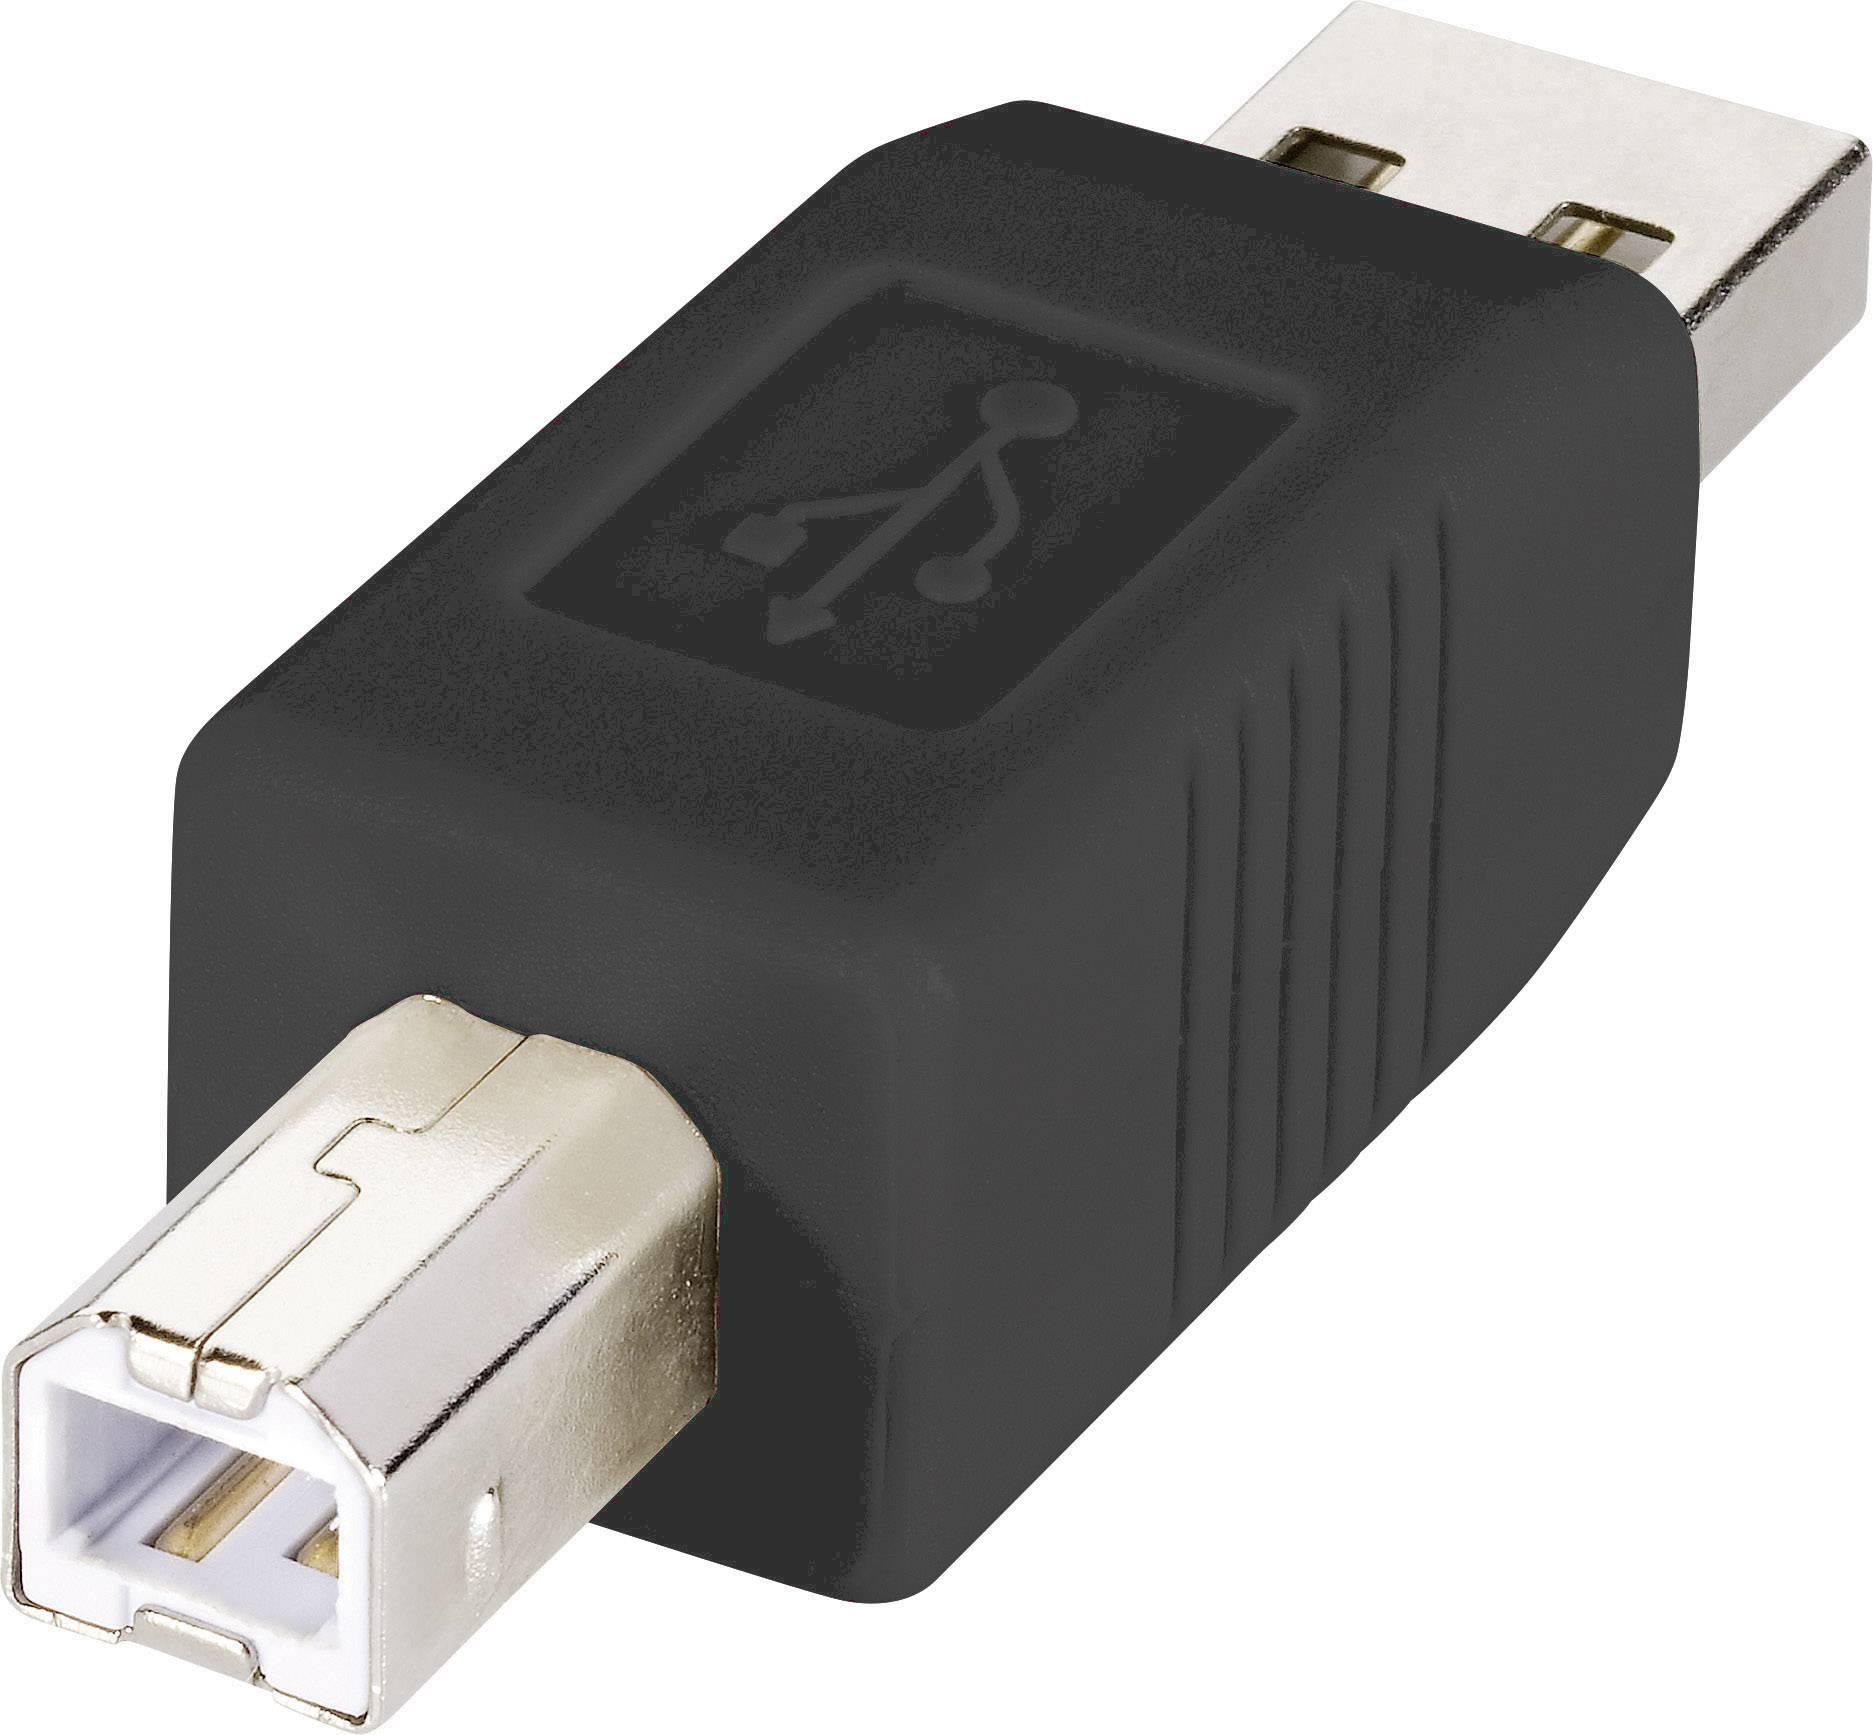 USB adaptér RENKFORCE 1x USB 2.0 zástrčka ⇔ 1x USB 2.0 zástrčka B, čierna, pozlátený